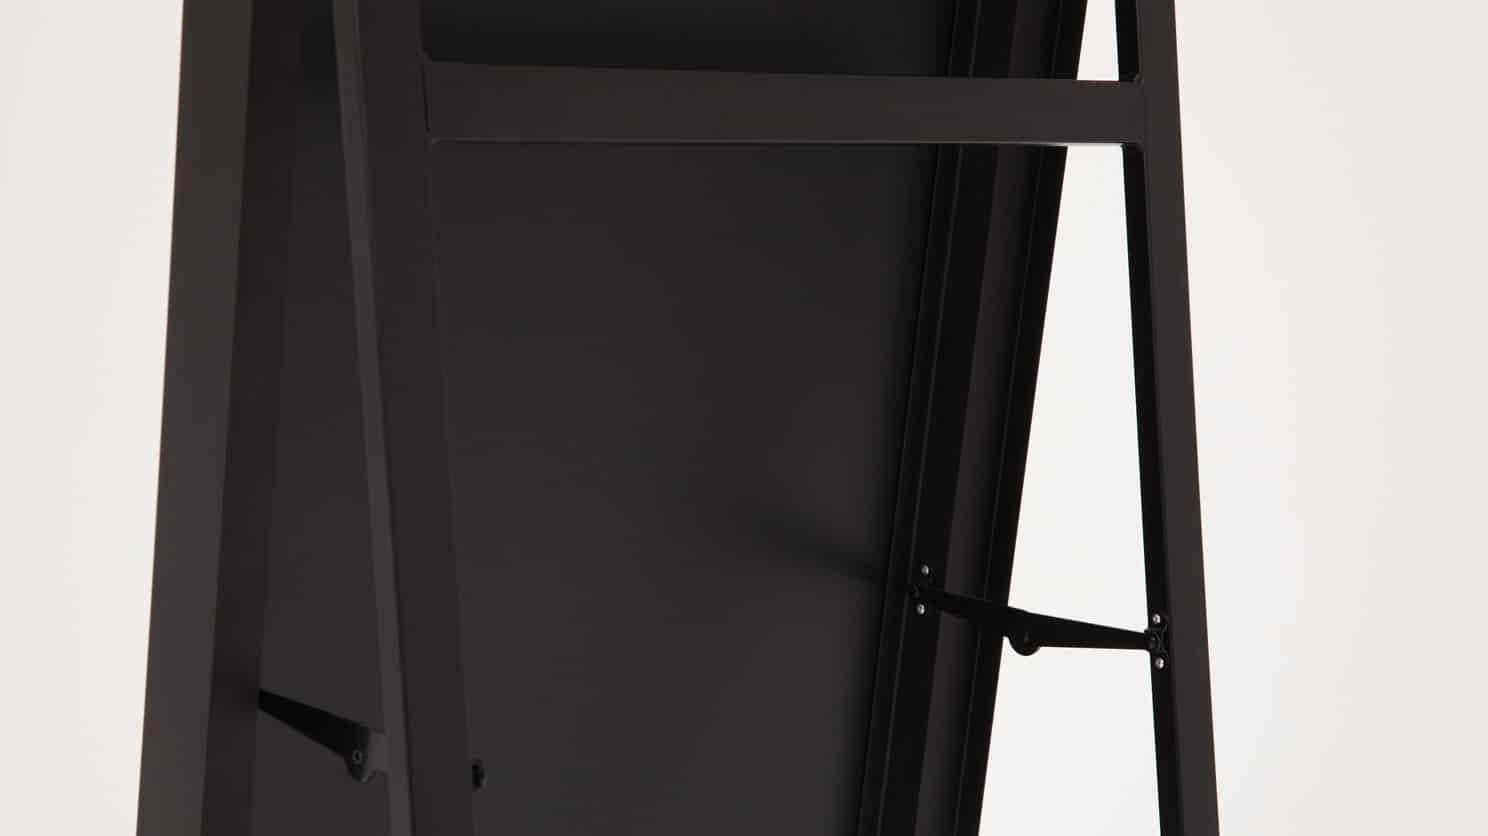 3130 204 6 4 mirror spy floor black detail